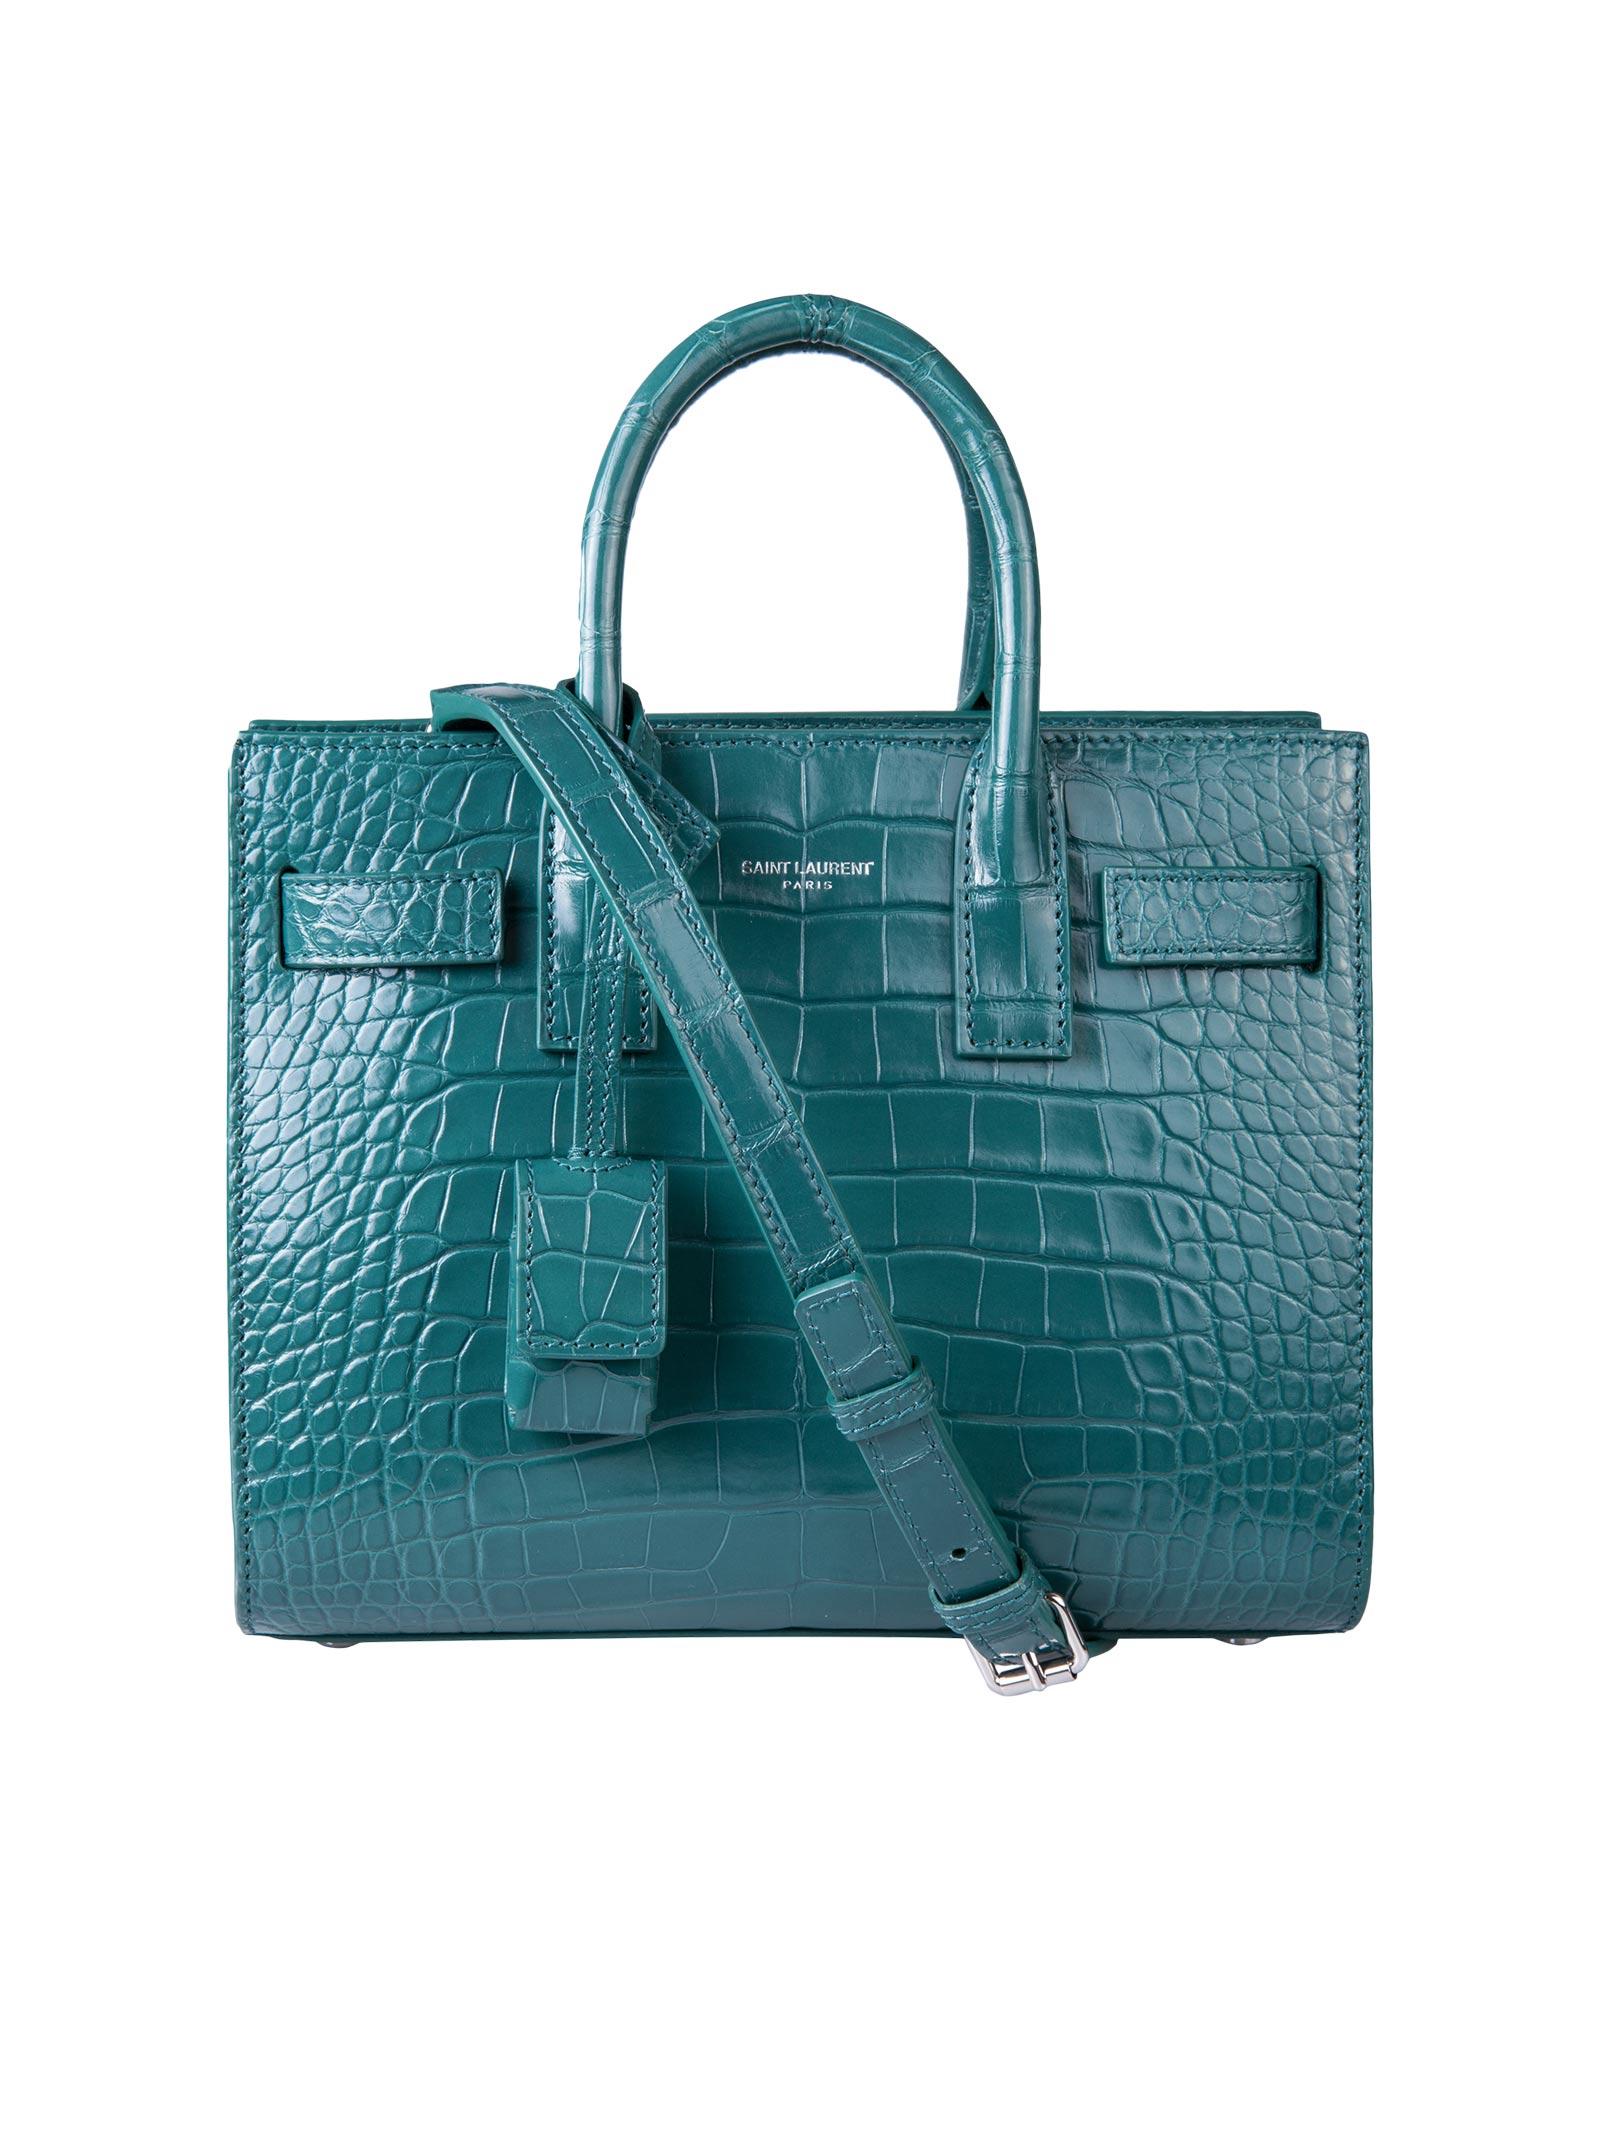 bb133aae1b7a5 Saint Laurent handbag - Saint Laurent - Michele Franzese Moda